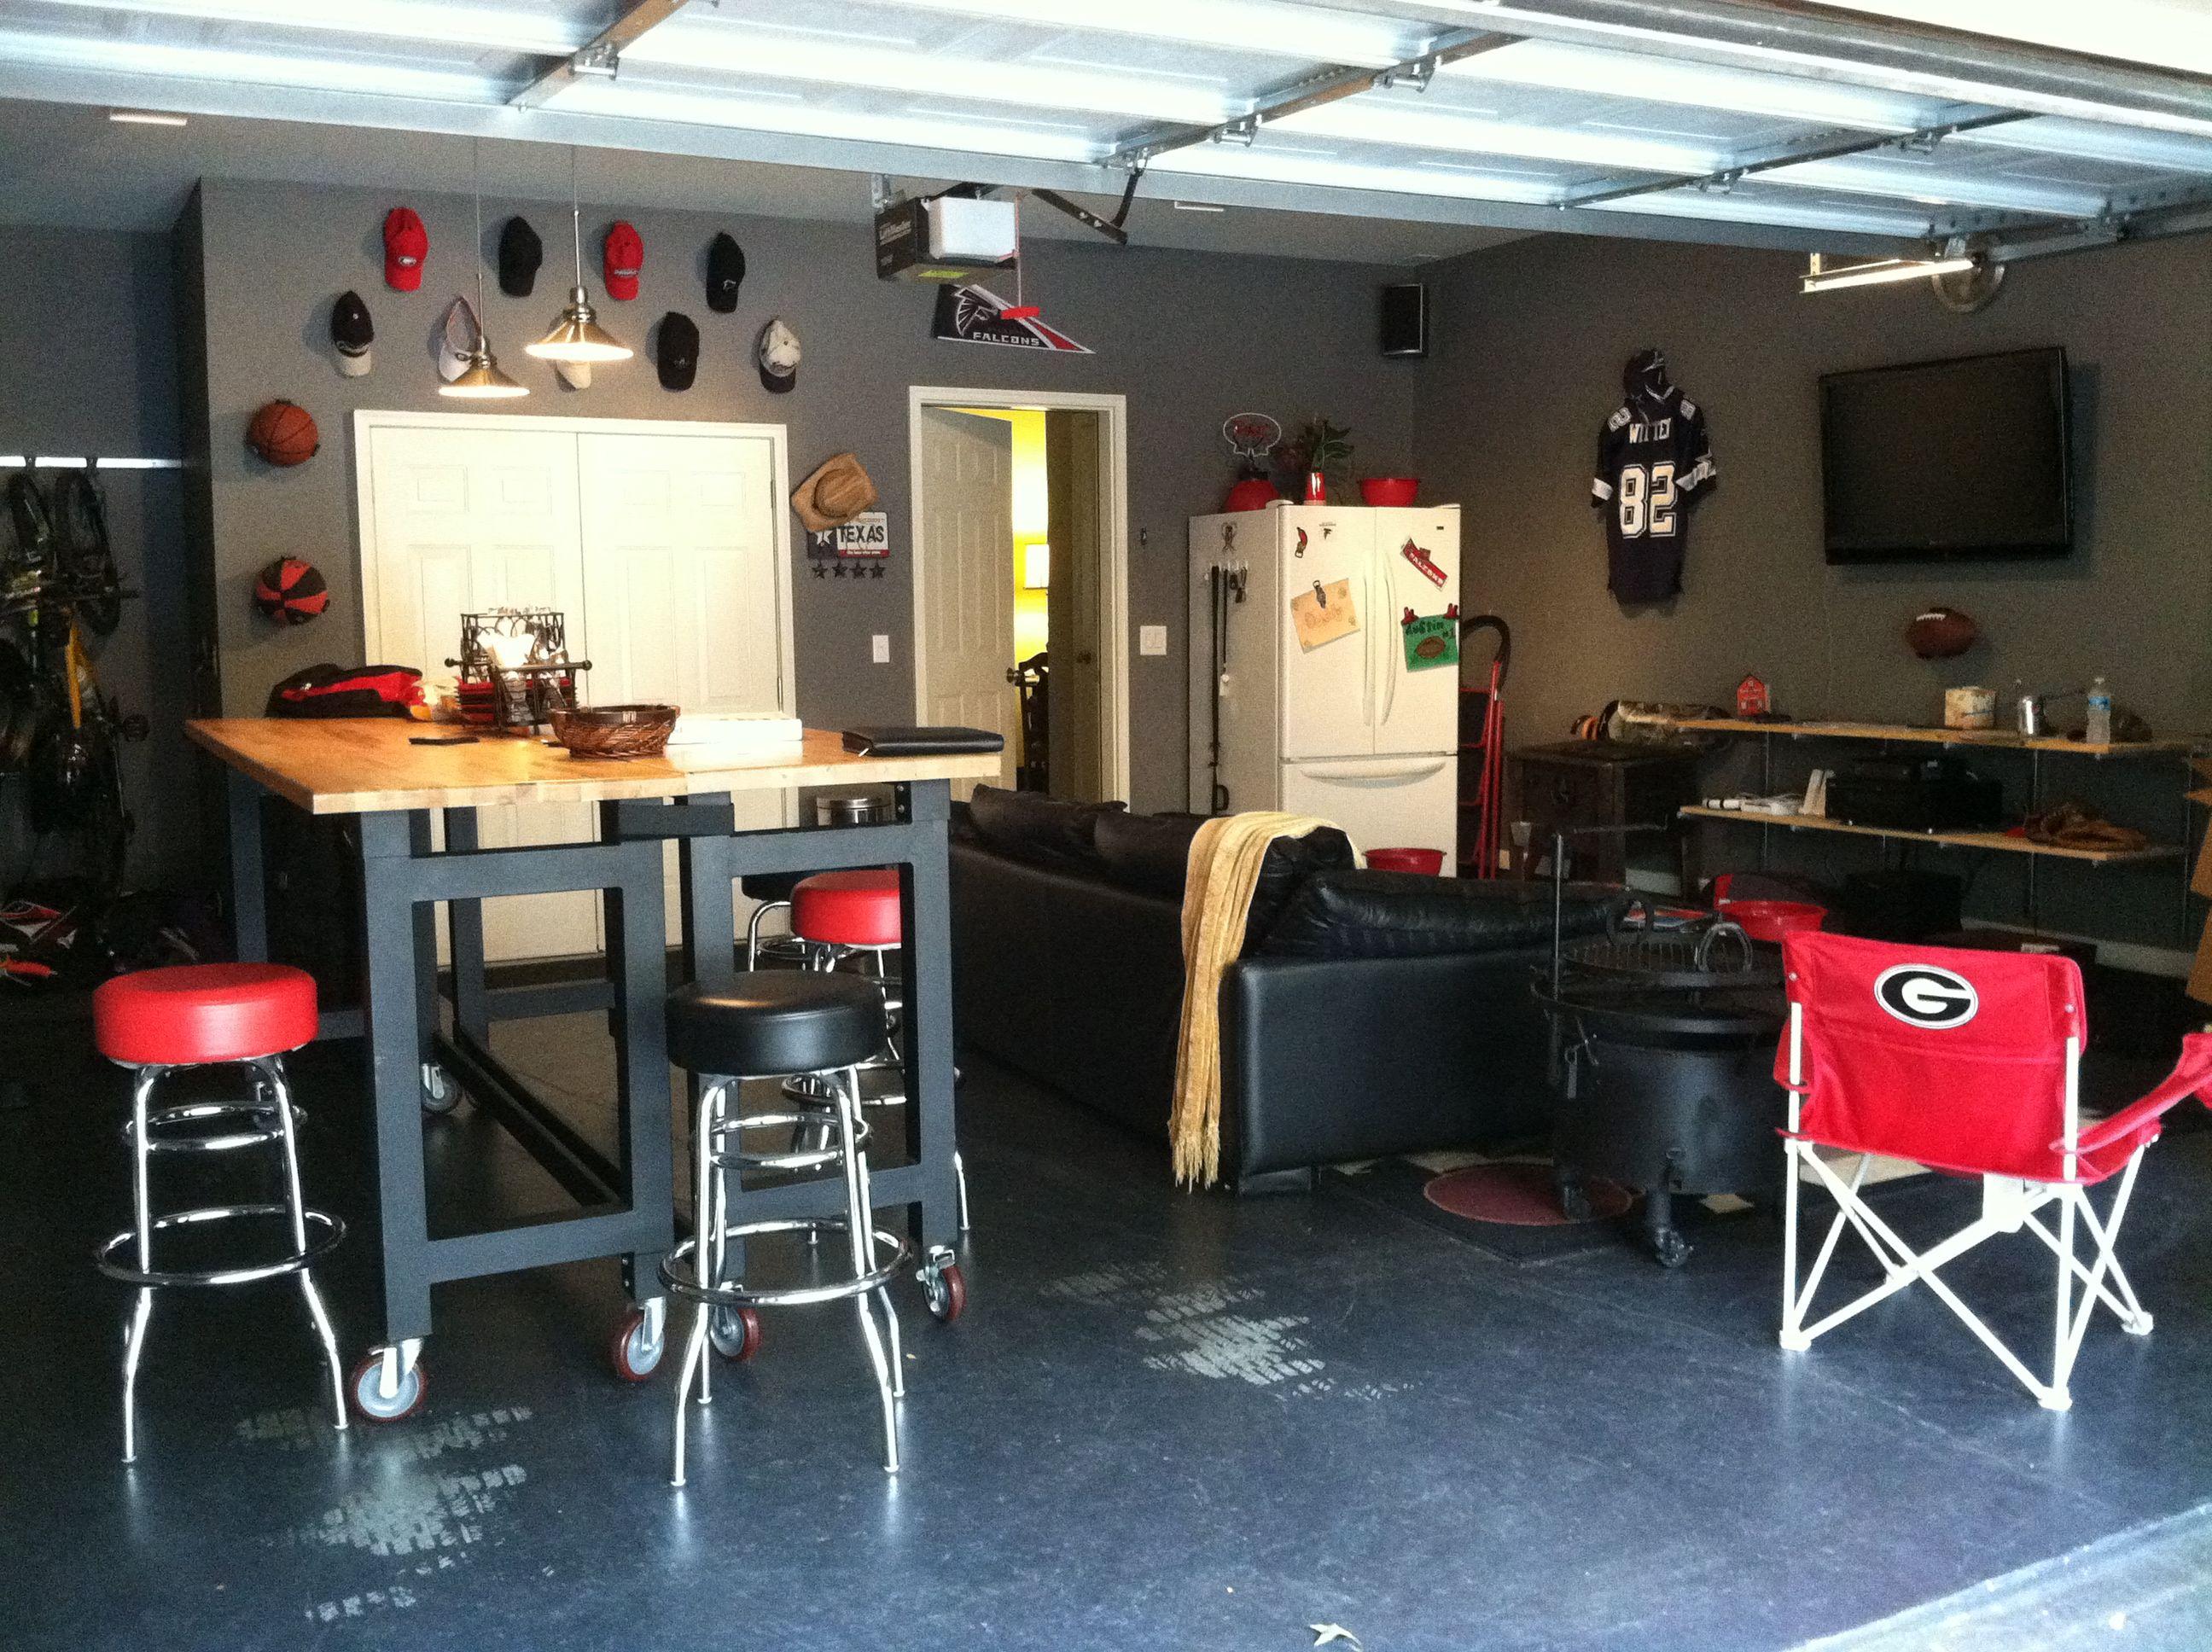 Garage Bar PJ Toups Garage Sports Bar MANLAND The Ultimate - Man cave garage bar